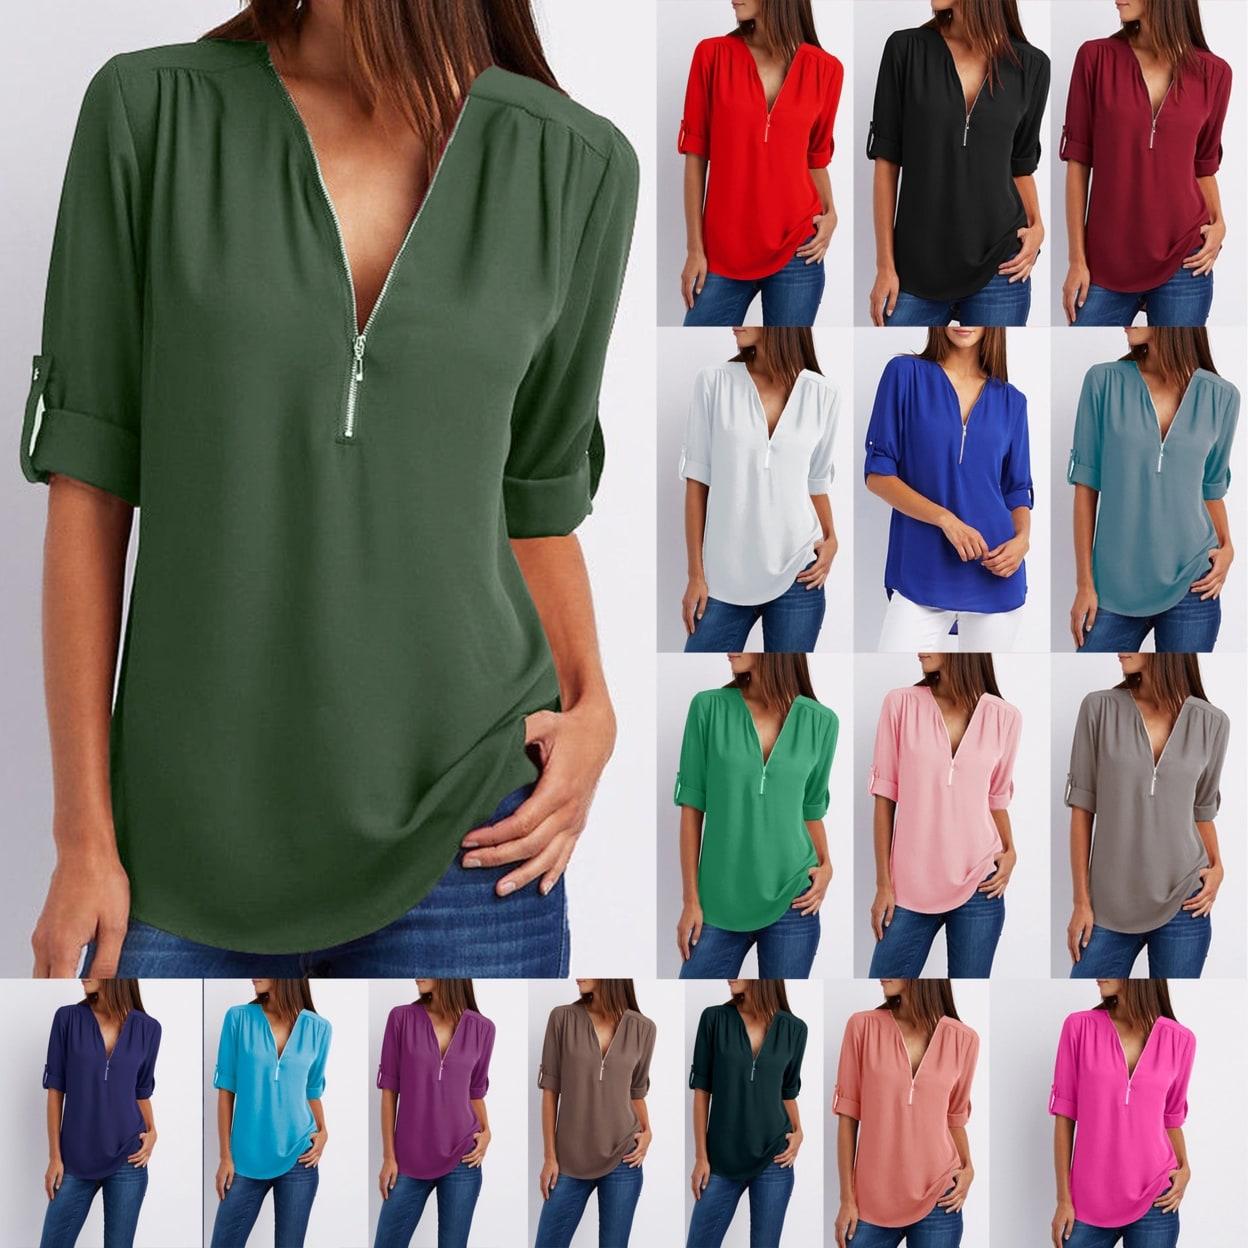 79dc7f6e Shop Chiffon Zipper Blouse - Free Shipping On Orders Over $45 ...